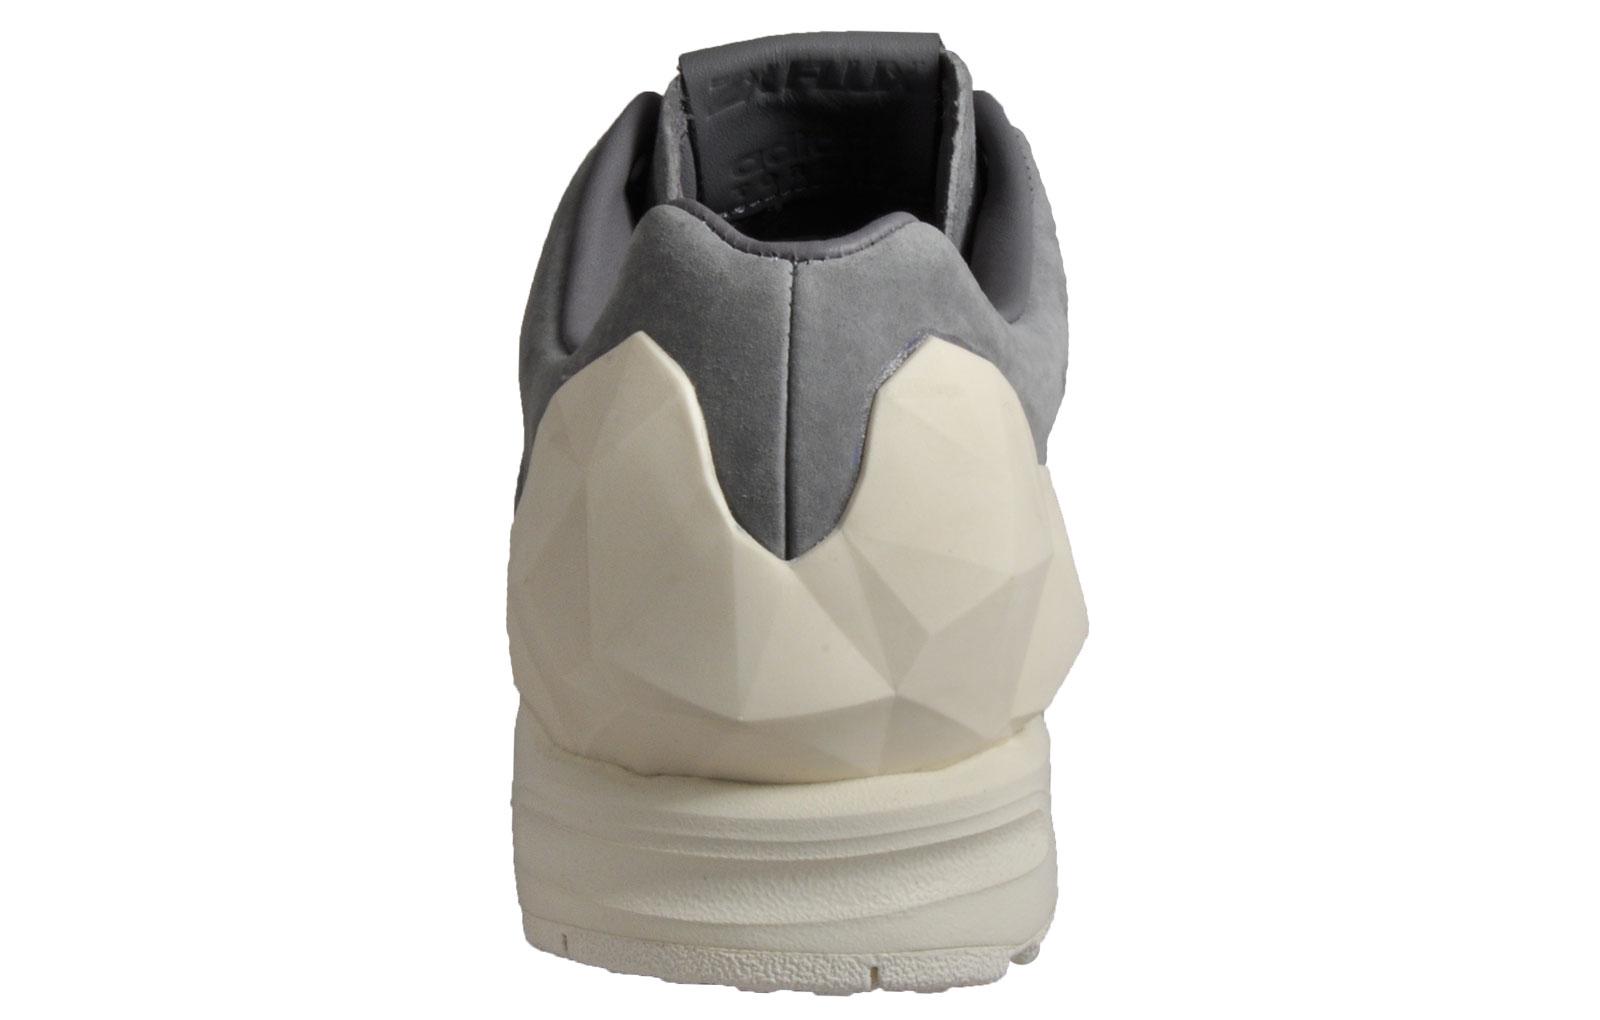 033ac011e Adidas Originals ZX Flux Jewel Women s Classic Casual Retro Trainers Grey